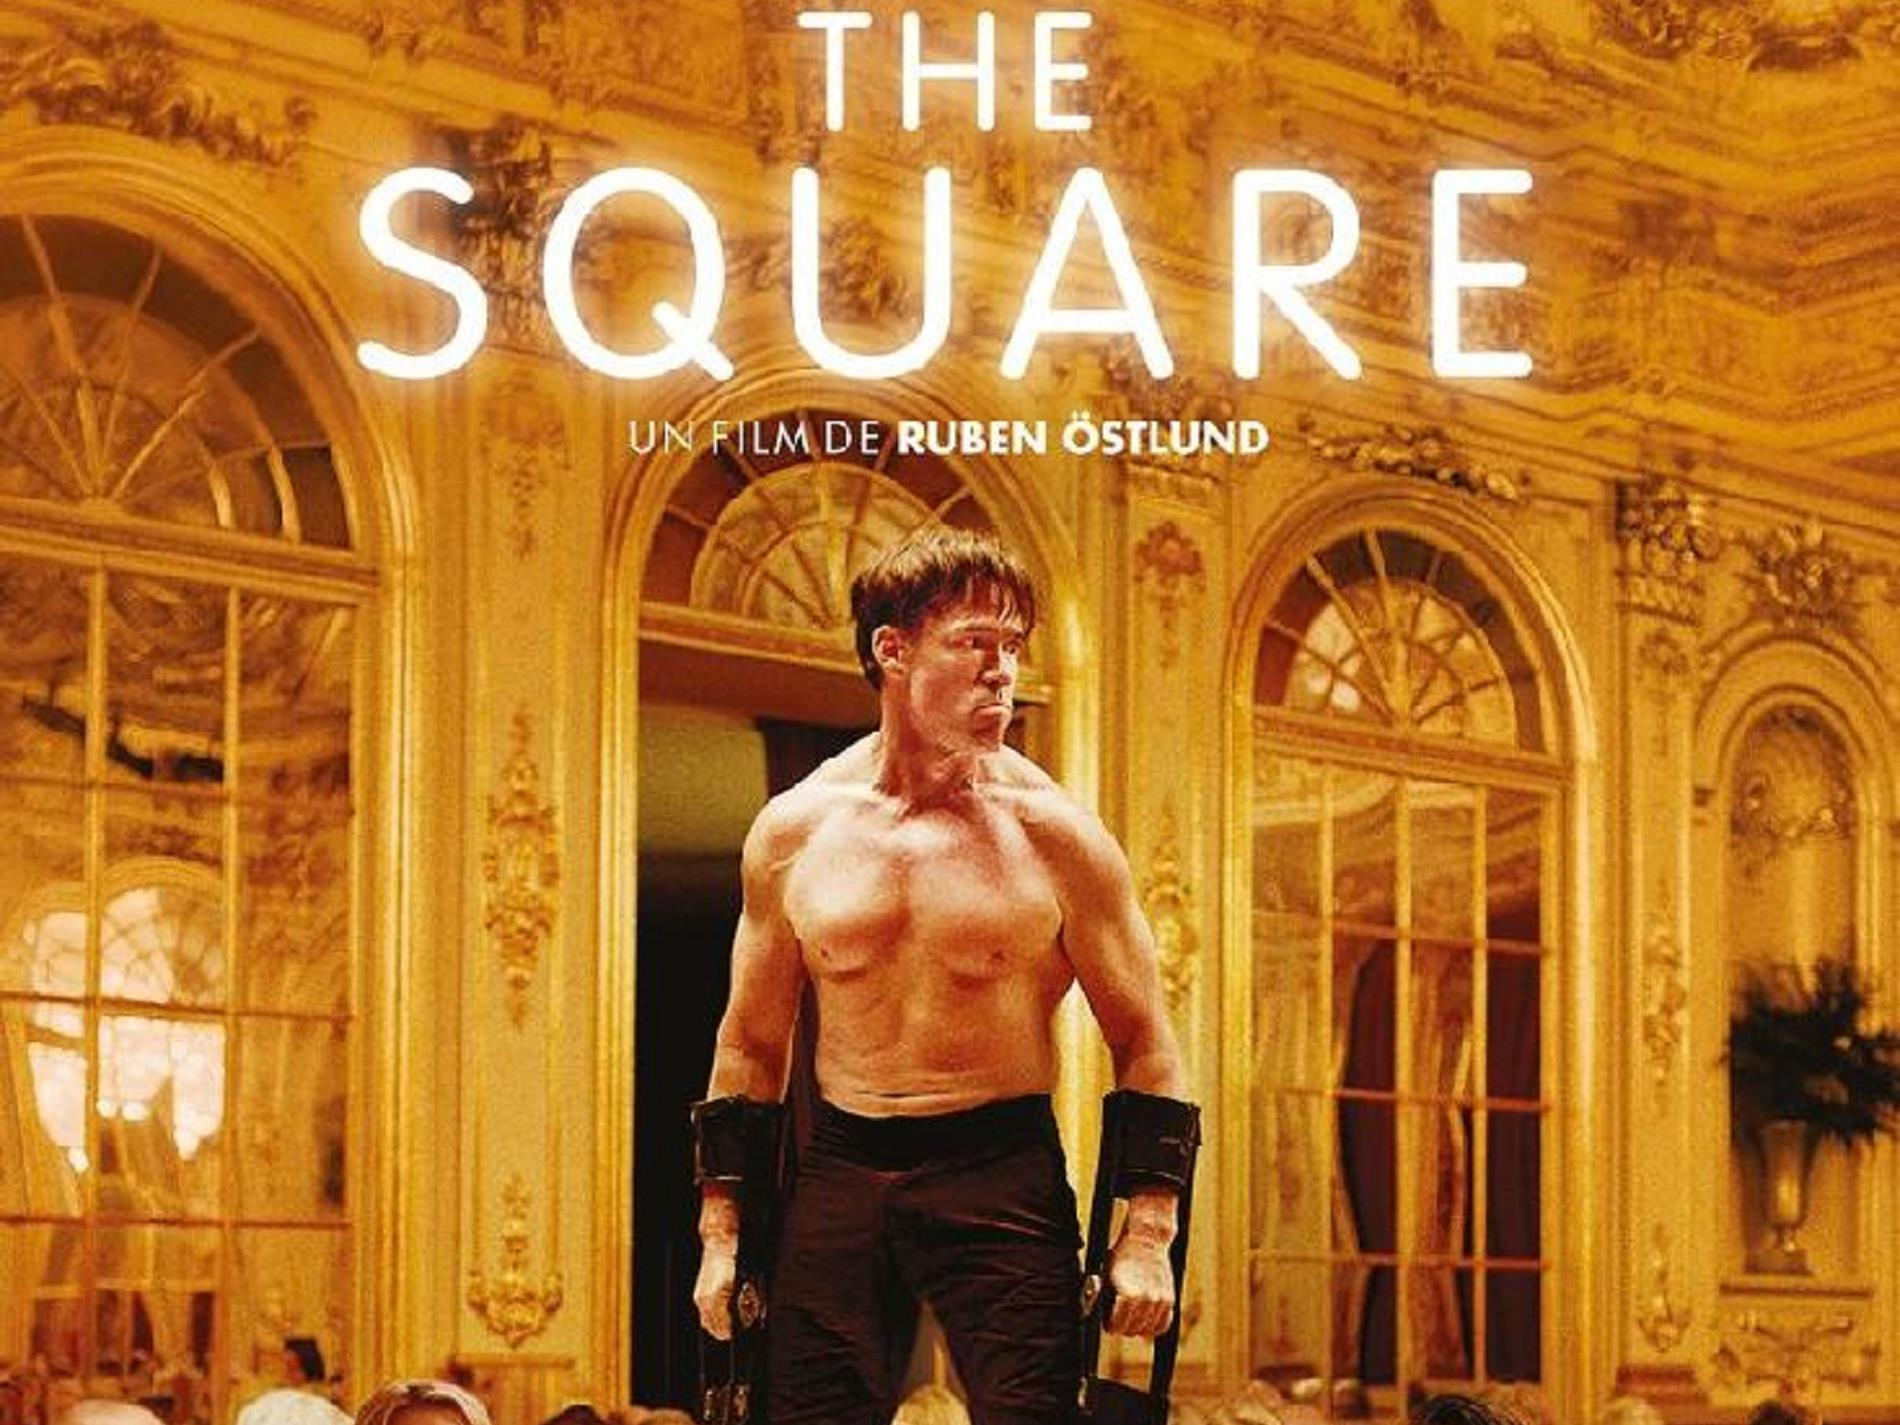 Film Club SMACH - Open air cinema- The Square